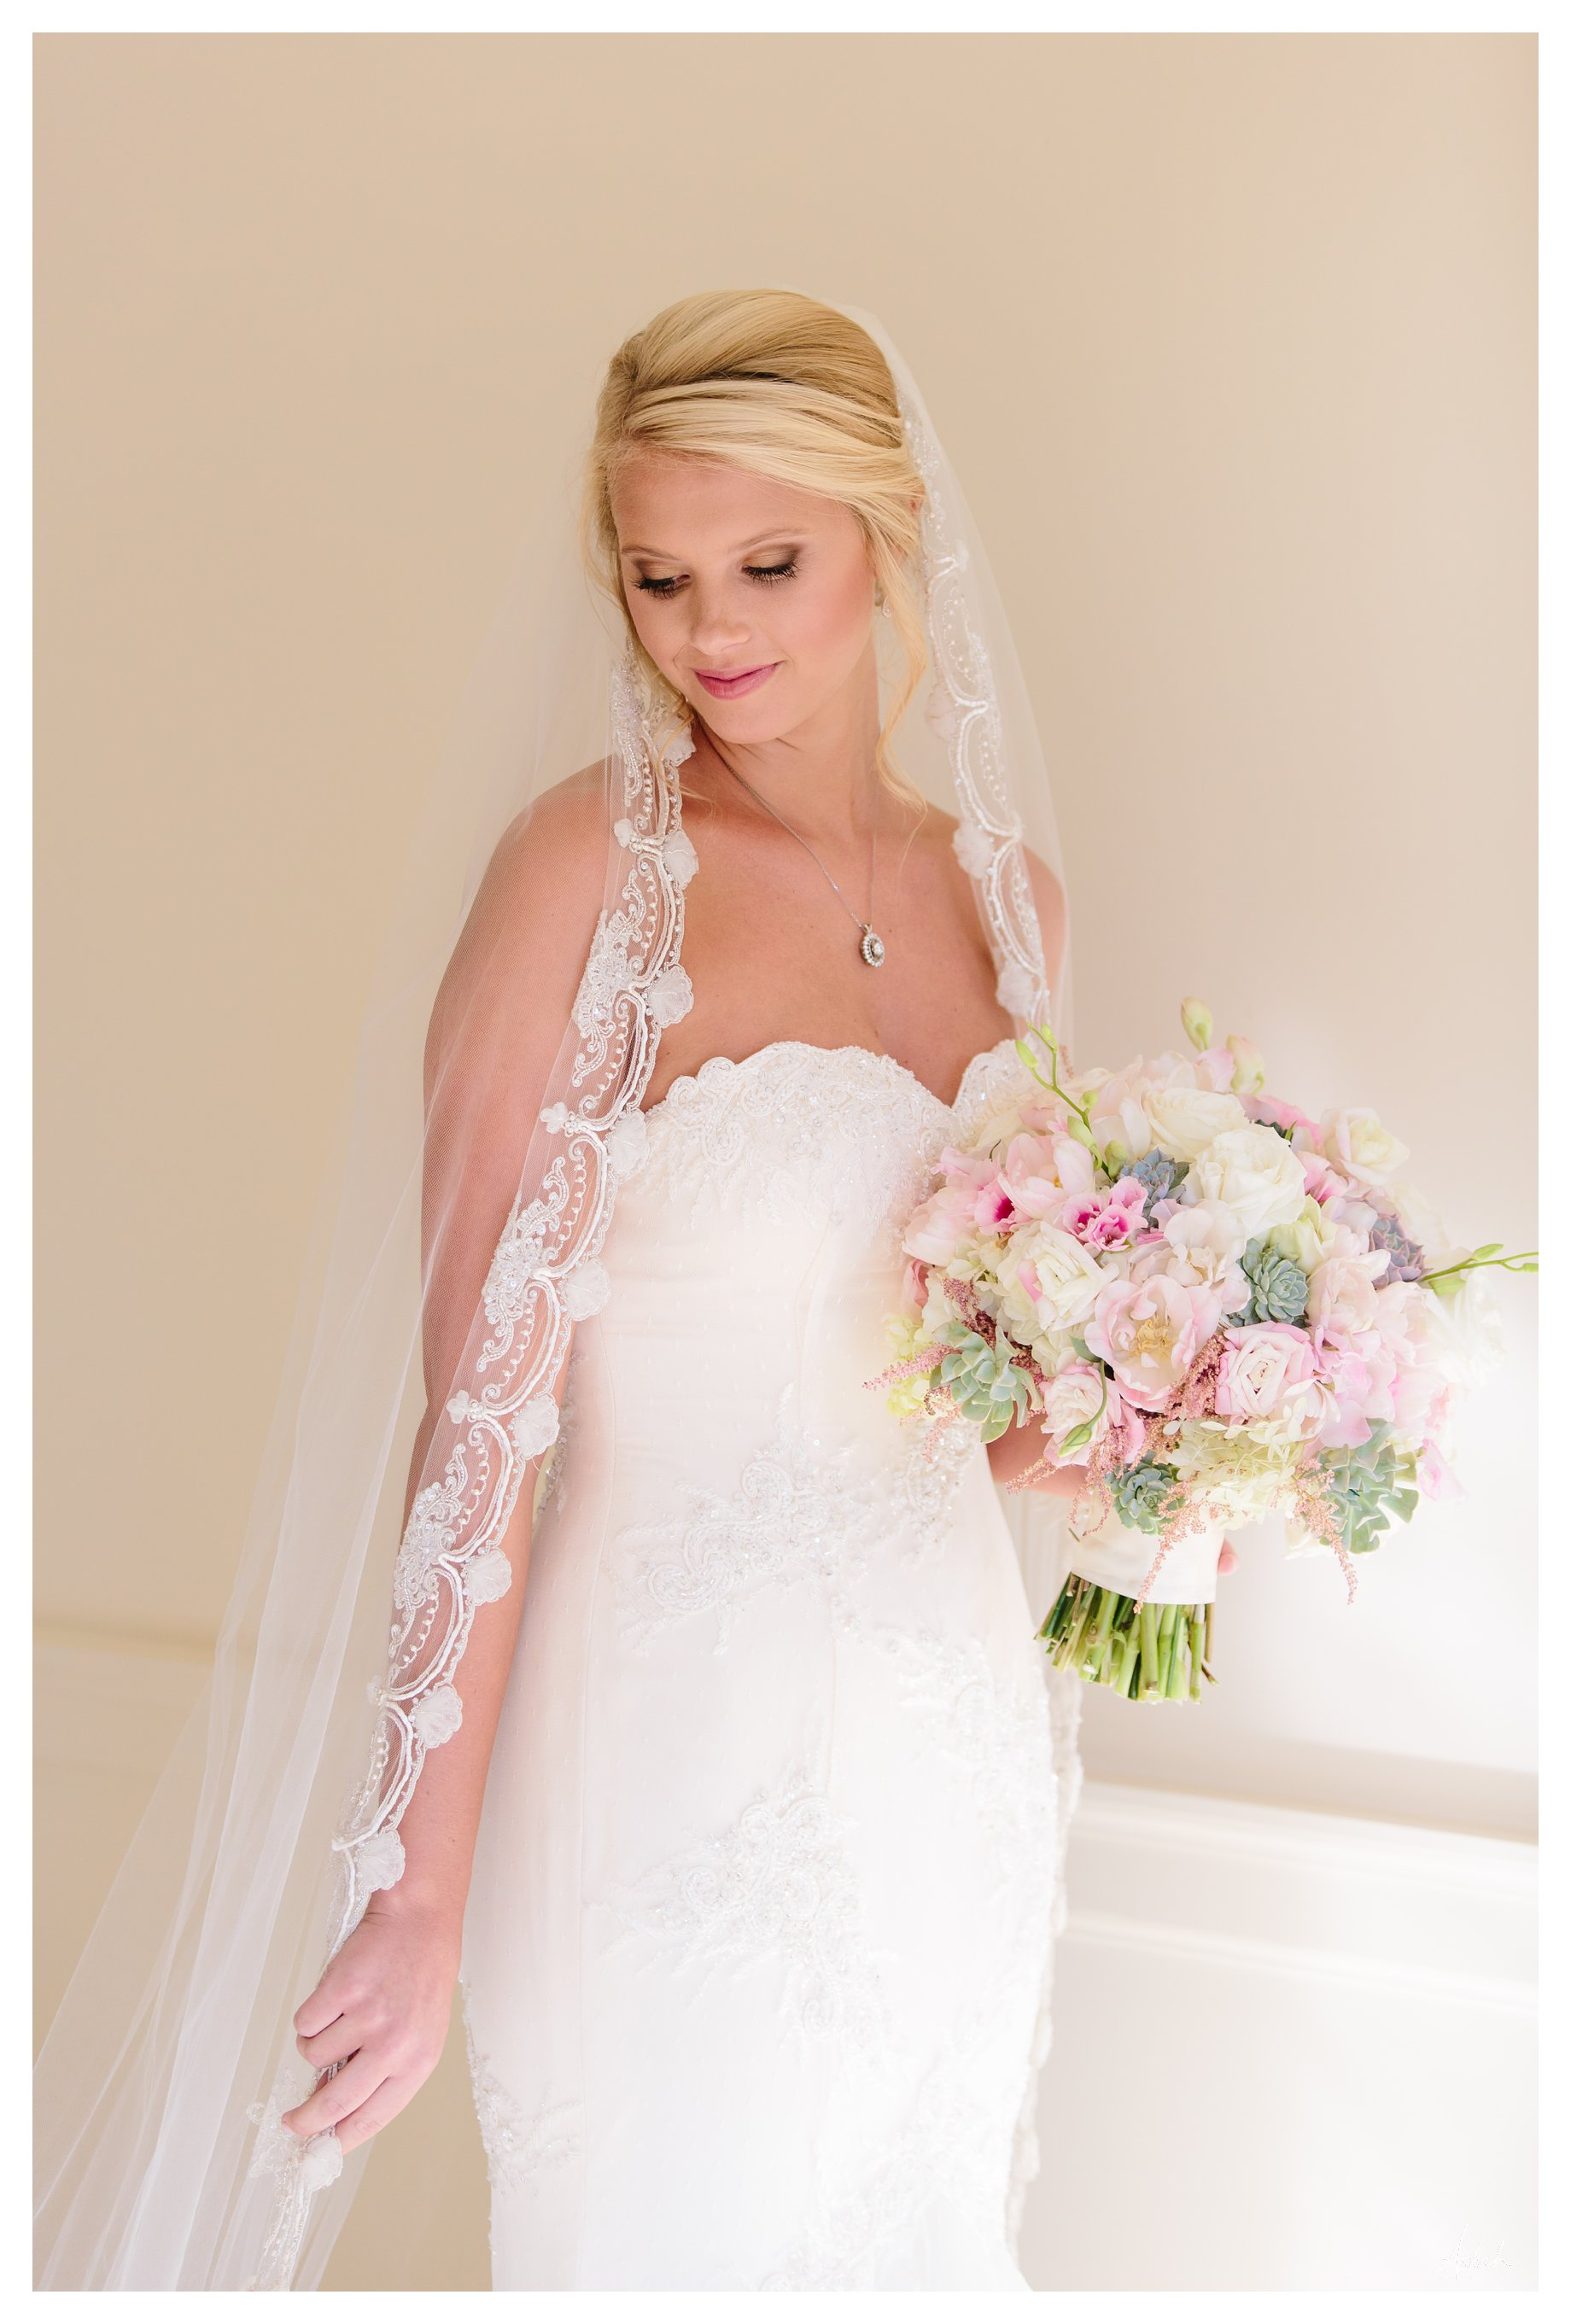 Perfection - The Bride - Macon Bridal Portraits